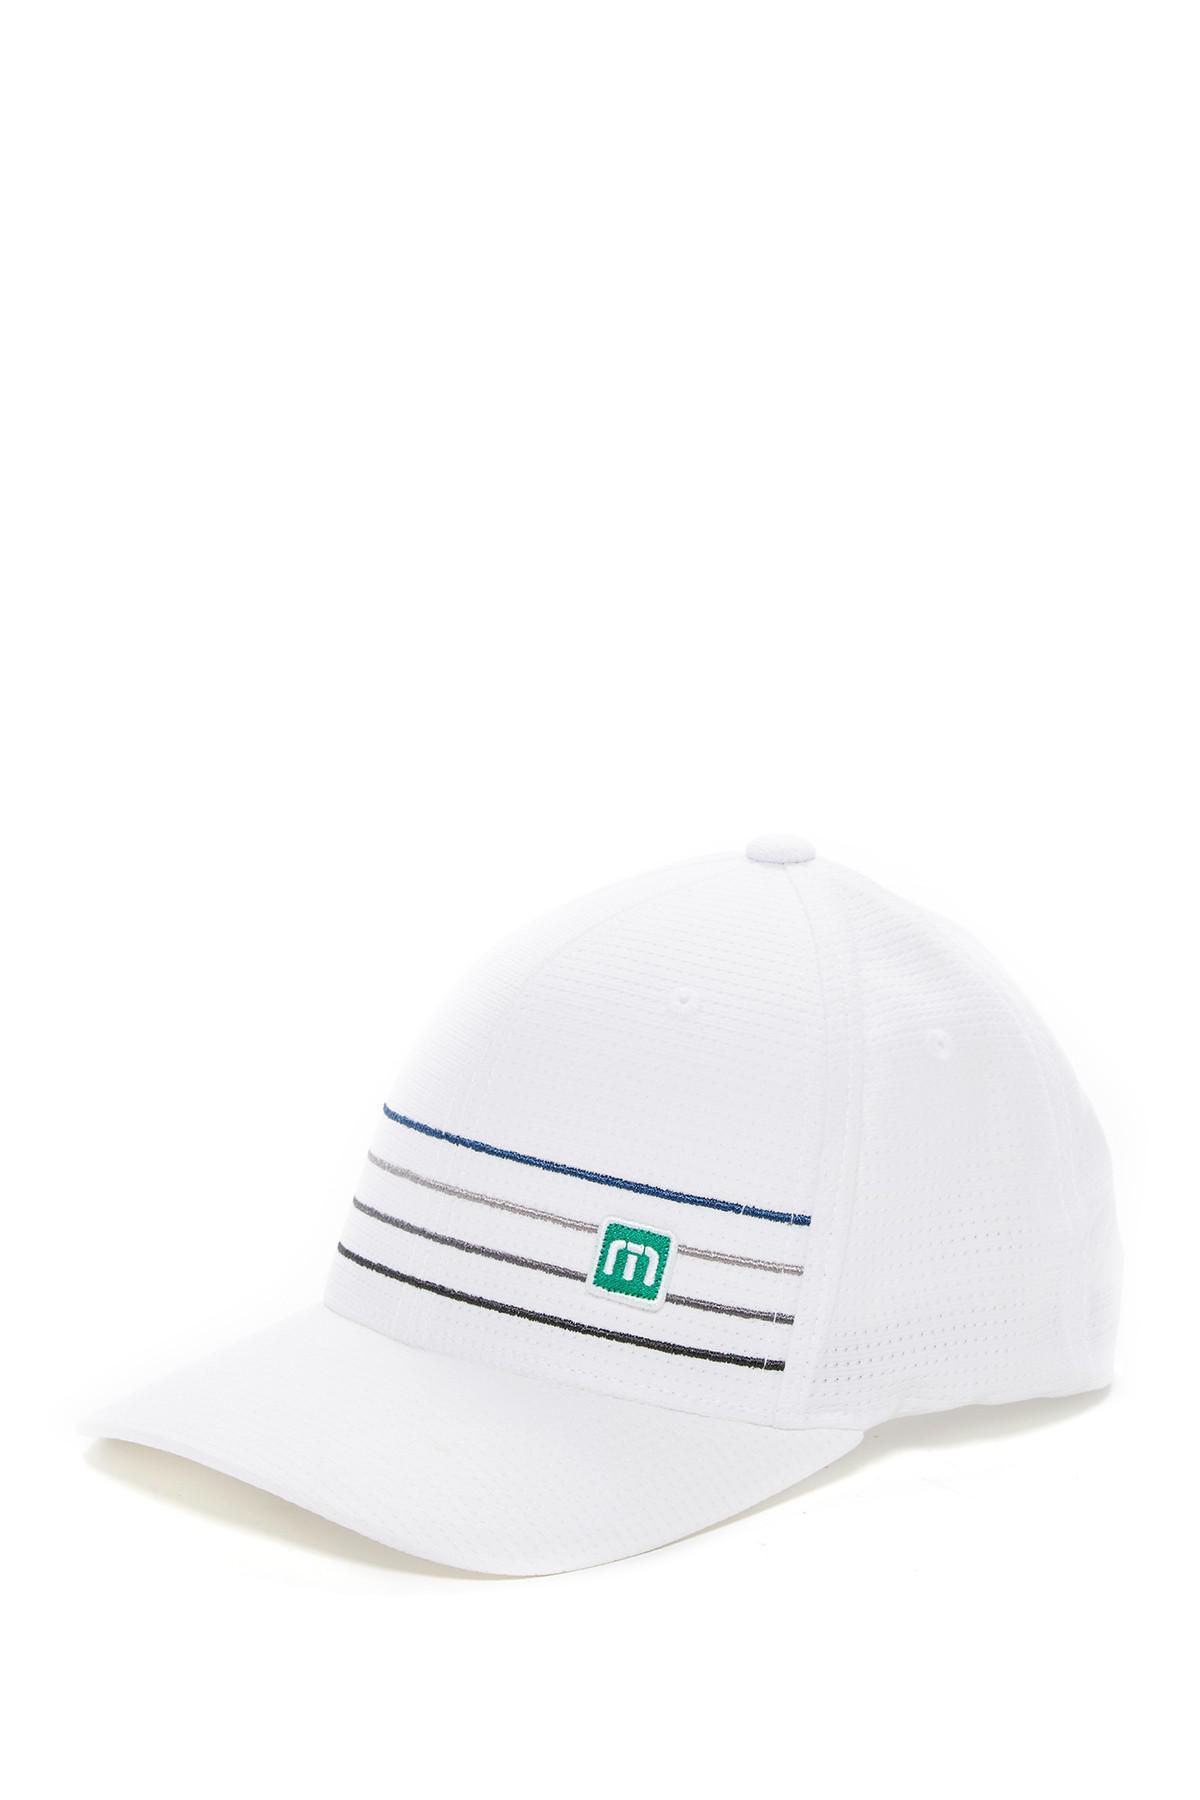 online store 9b9bd 2d235 ... denmark lyst travis mathew no chance hat in white for men c305b 9687d  ...